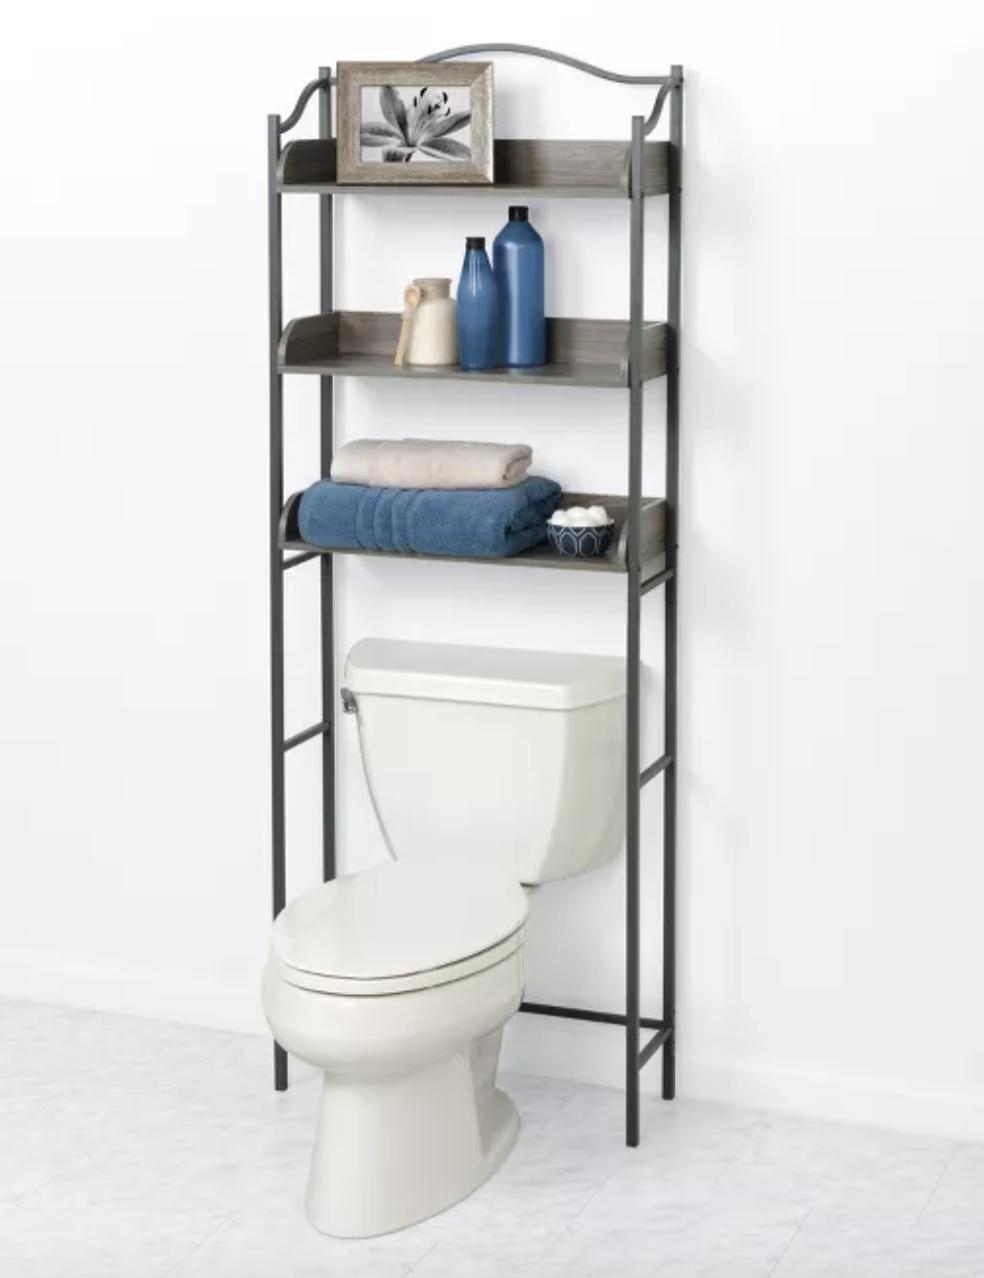 brown storage unit with three shelves above white toilet